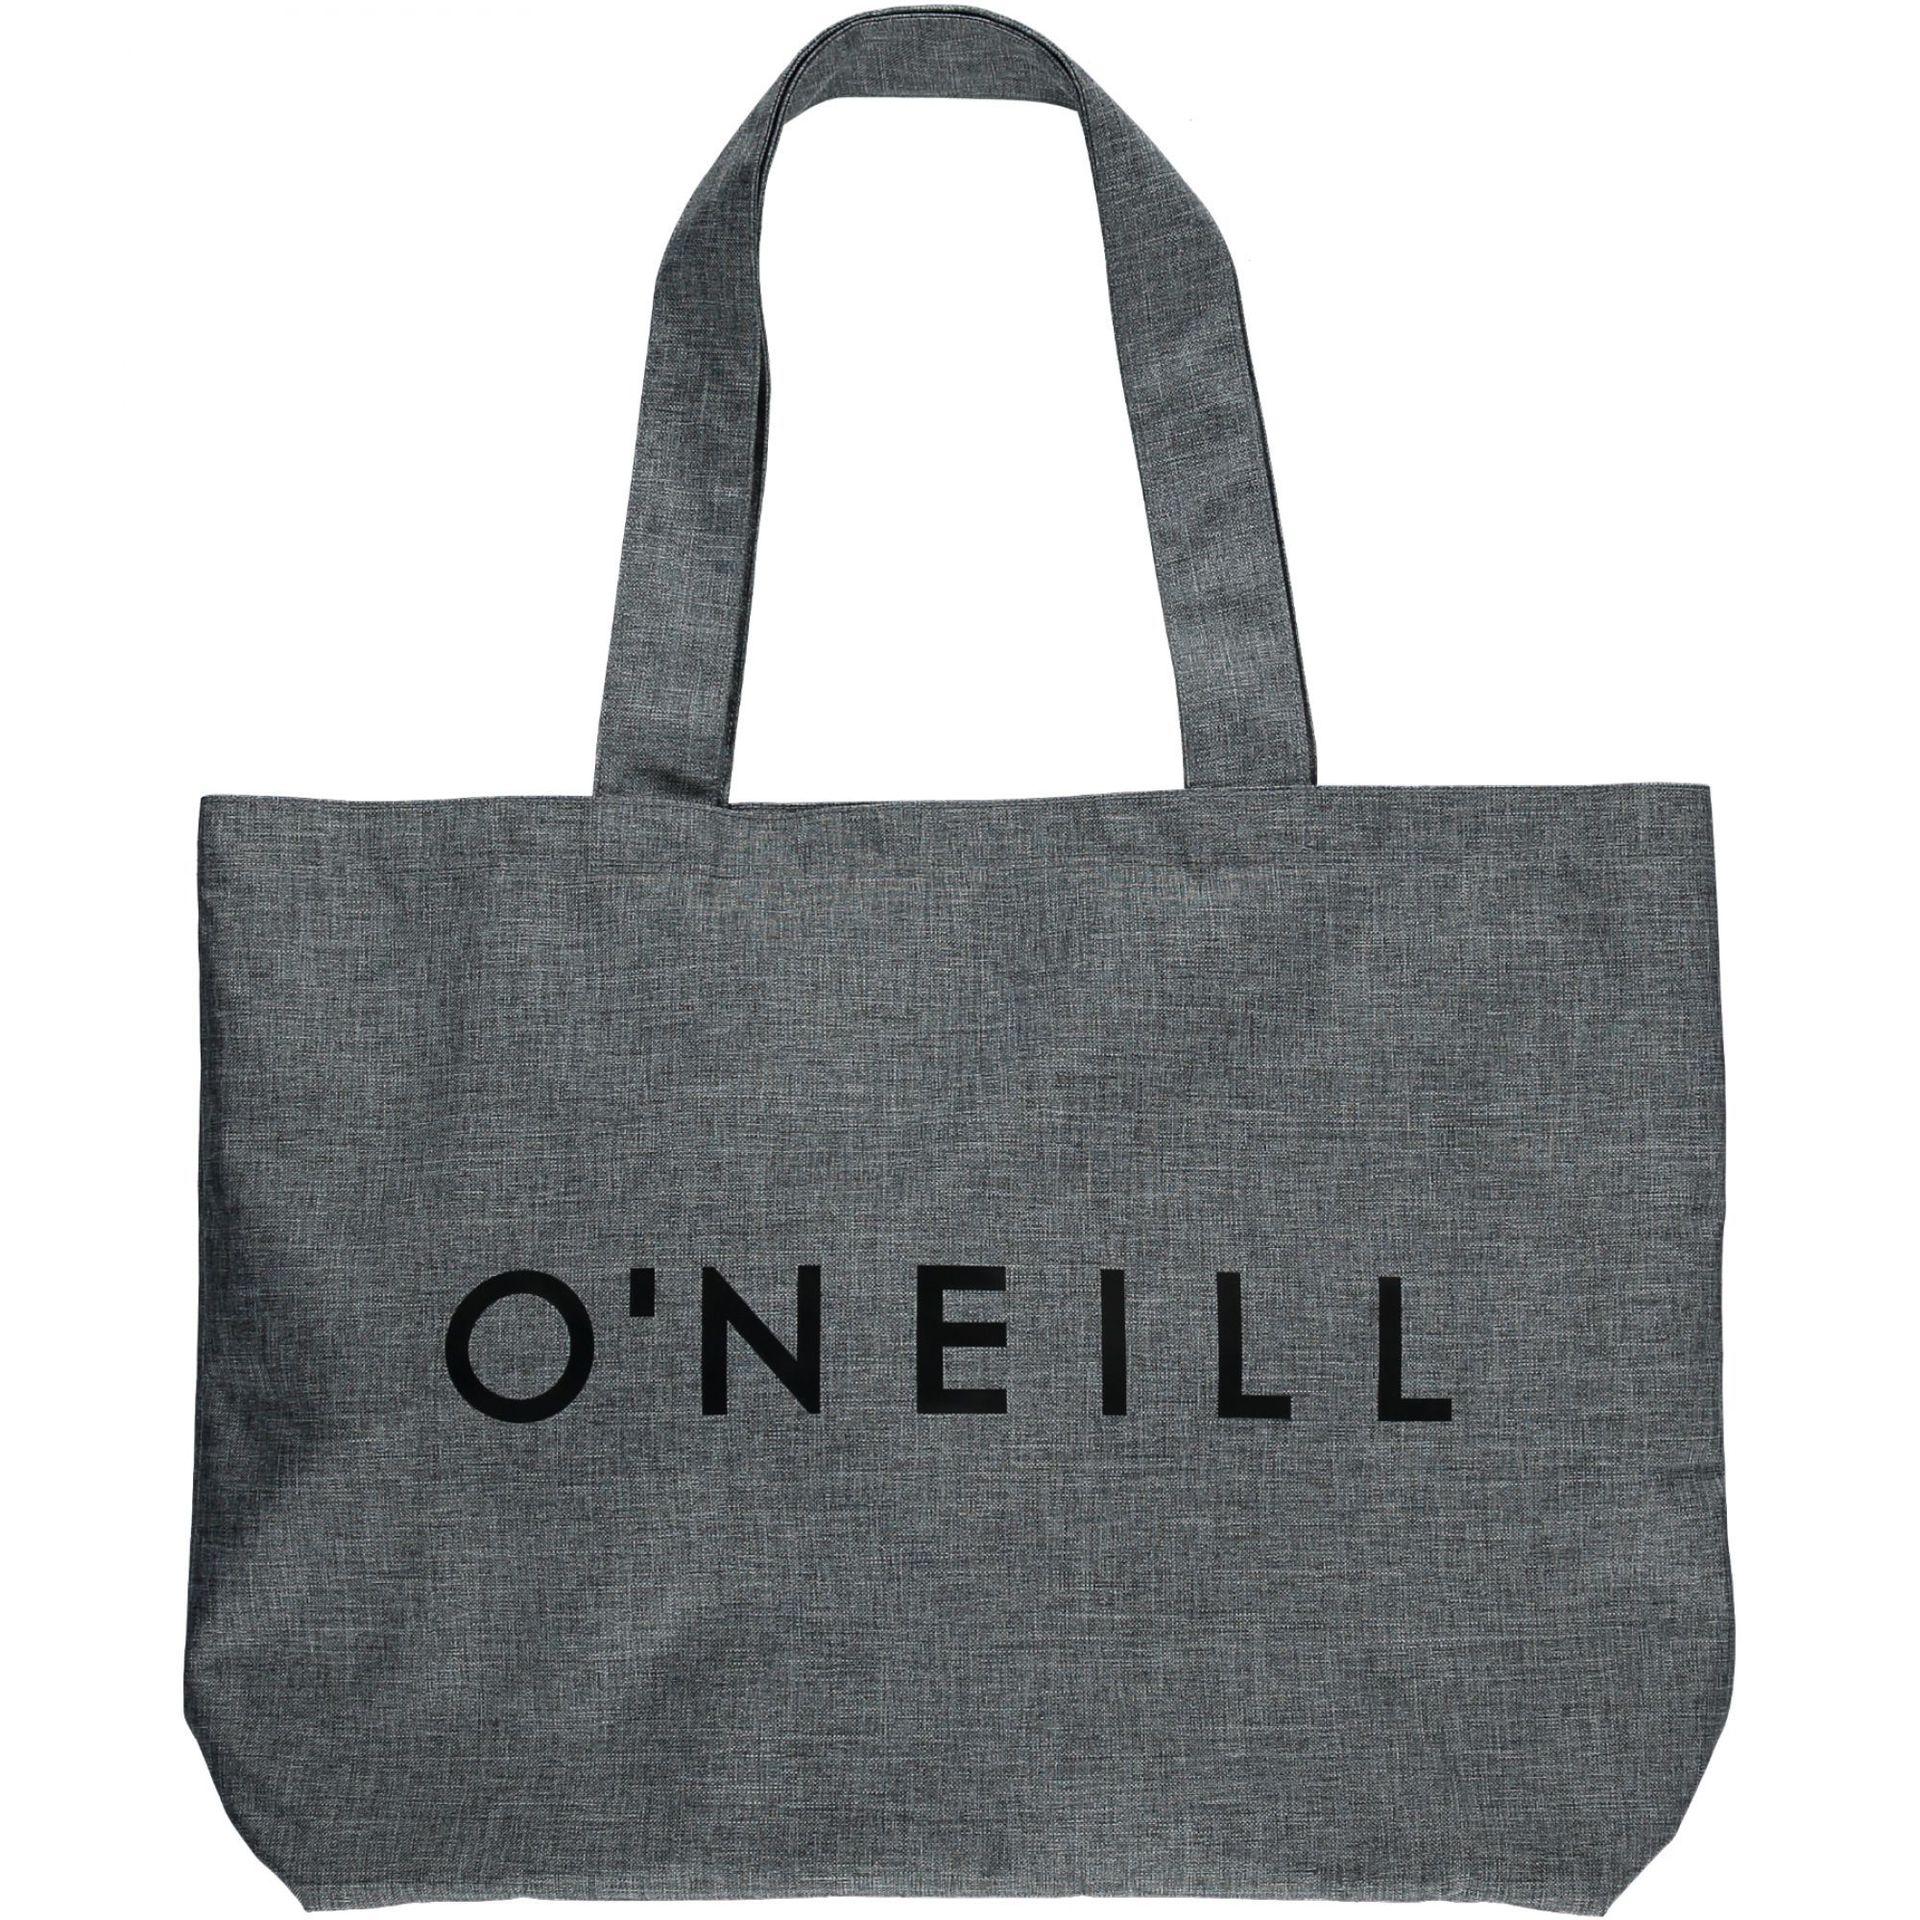 OREBKA ONEILL EVERYDAY SHOPPER MAREINE MELEE